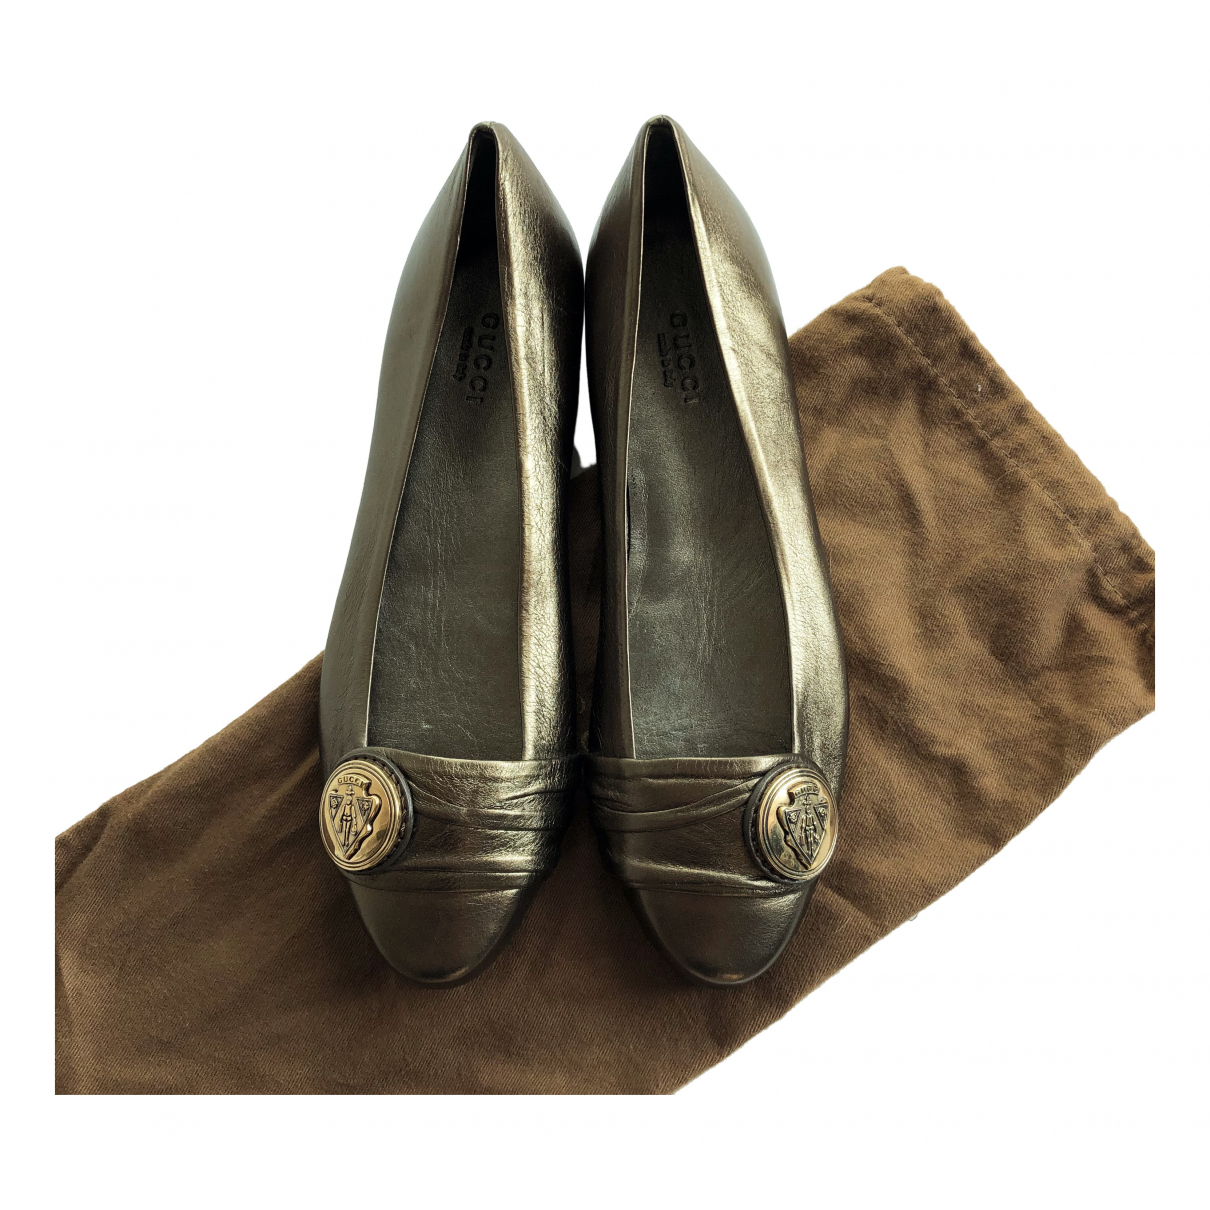 Gucci N Metallic Leather Ballet flats for Women 36 EU